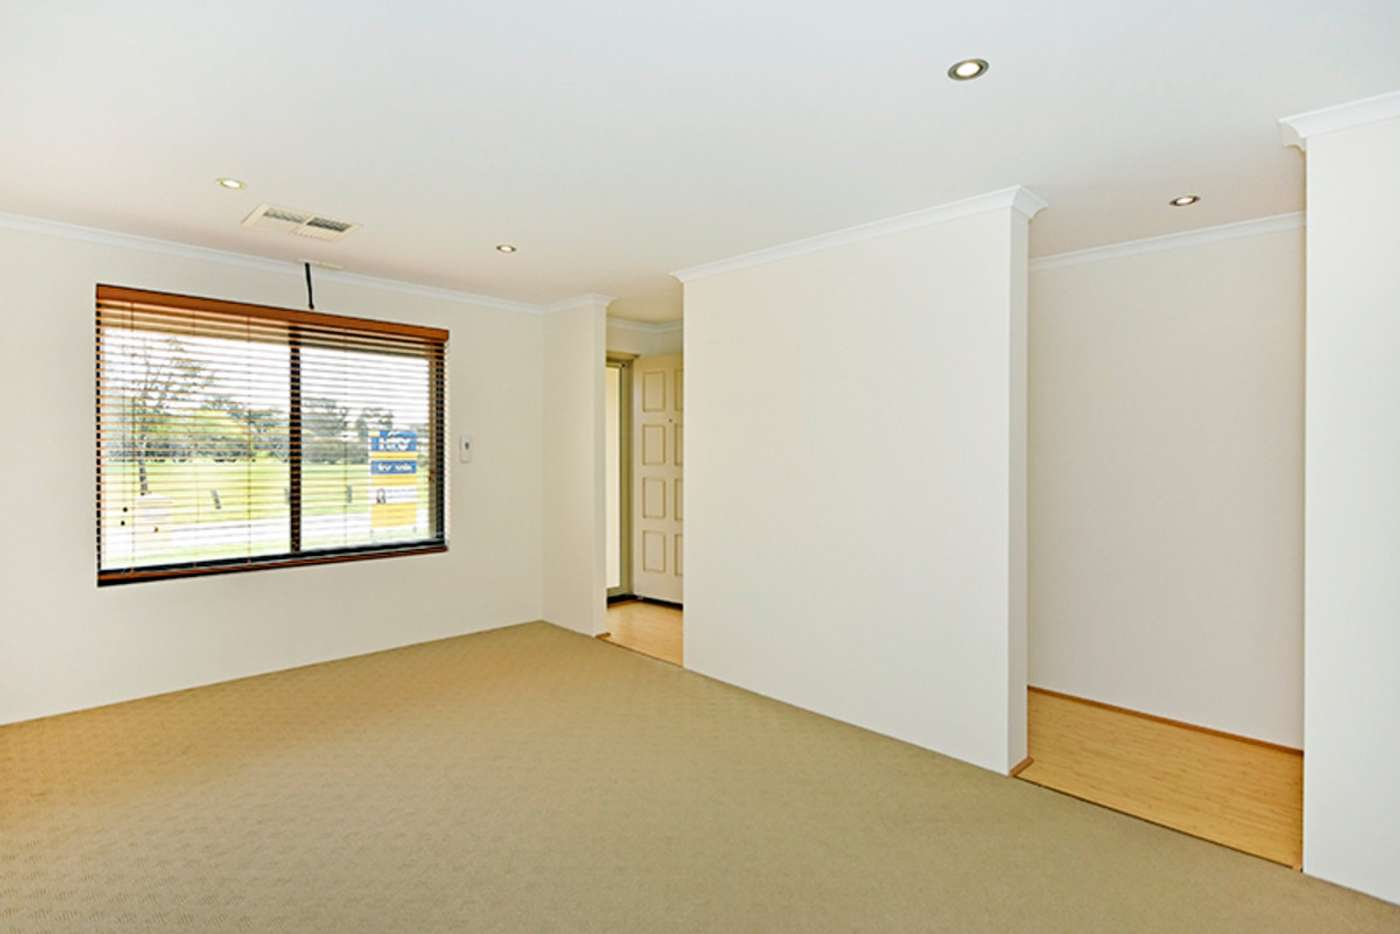 Sixth view of Homely house listing, 24 Barossa Gardens, Caversham WA 6055